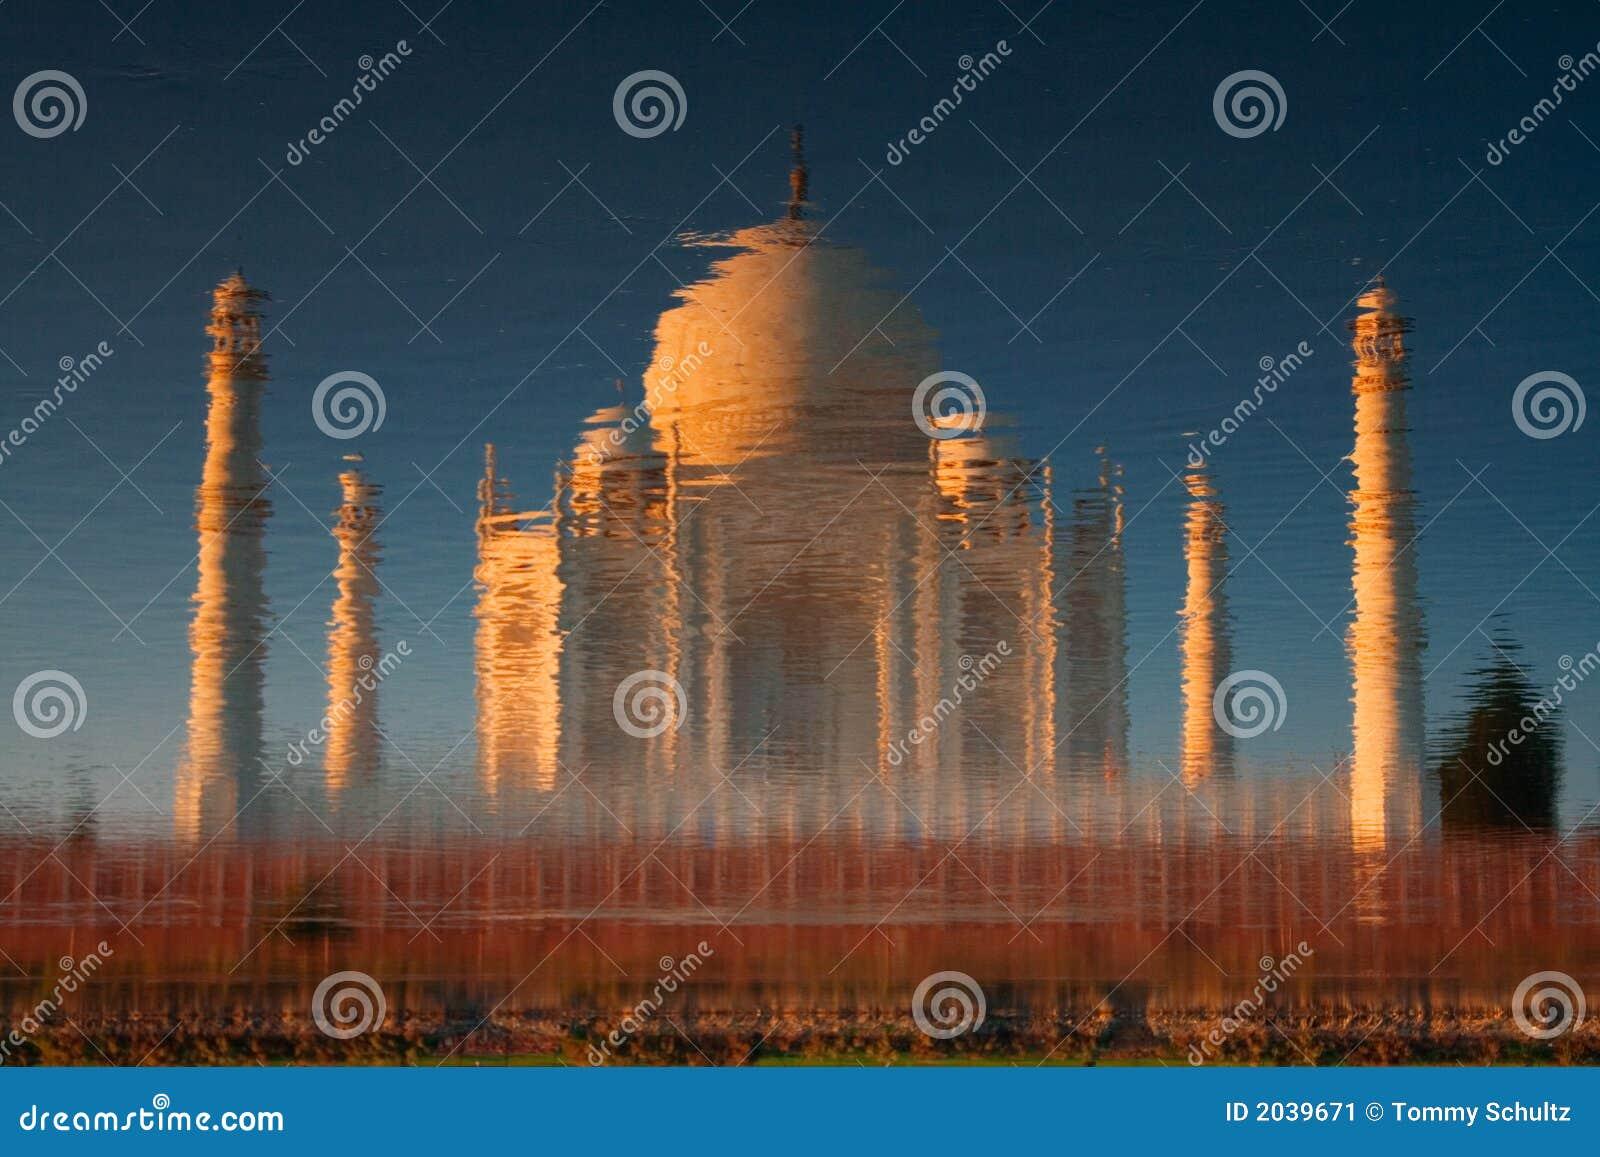 Taj Mahal refletido no rio